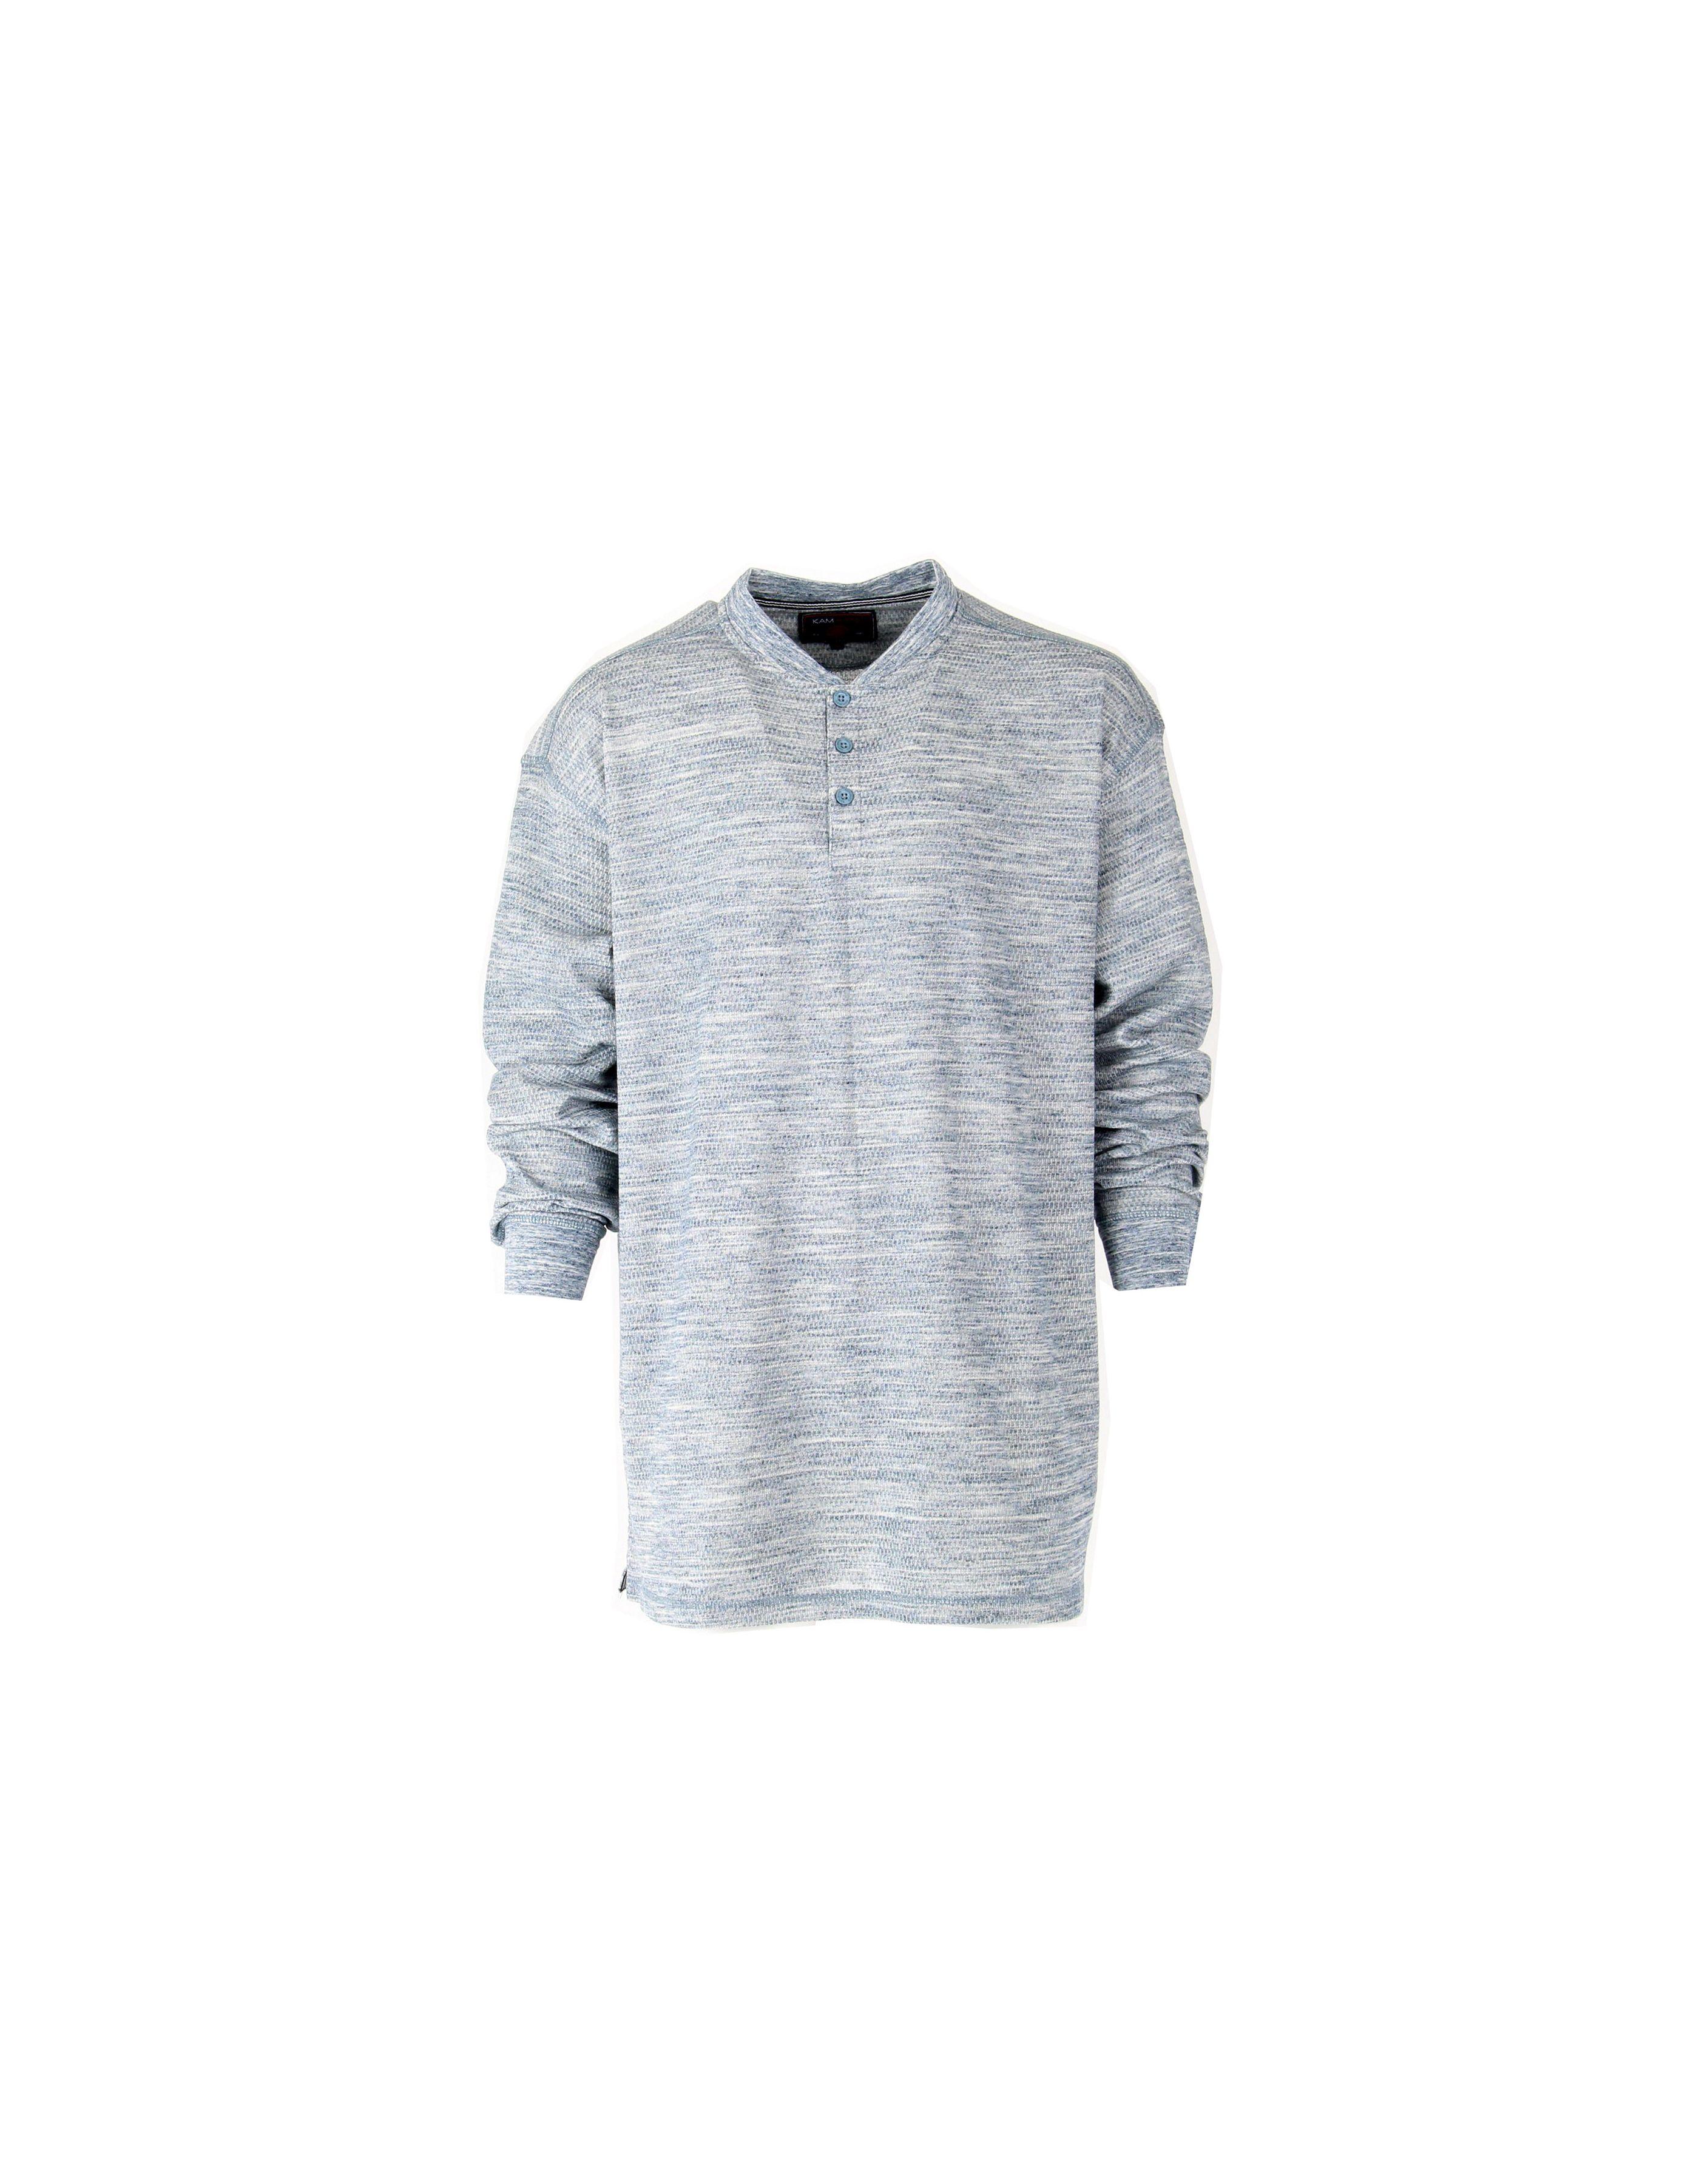 T shirt manches longues chiné col 3 boutons